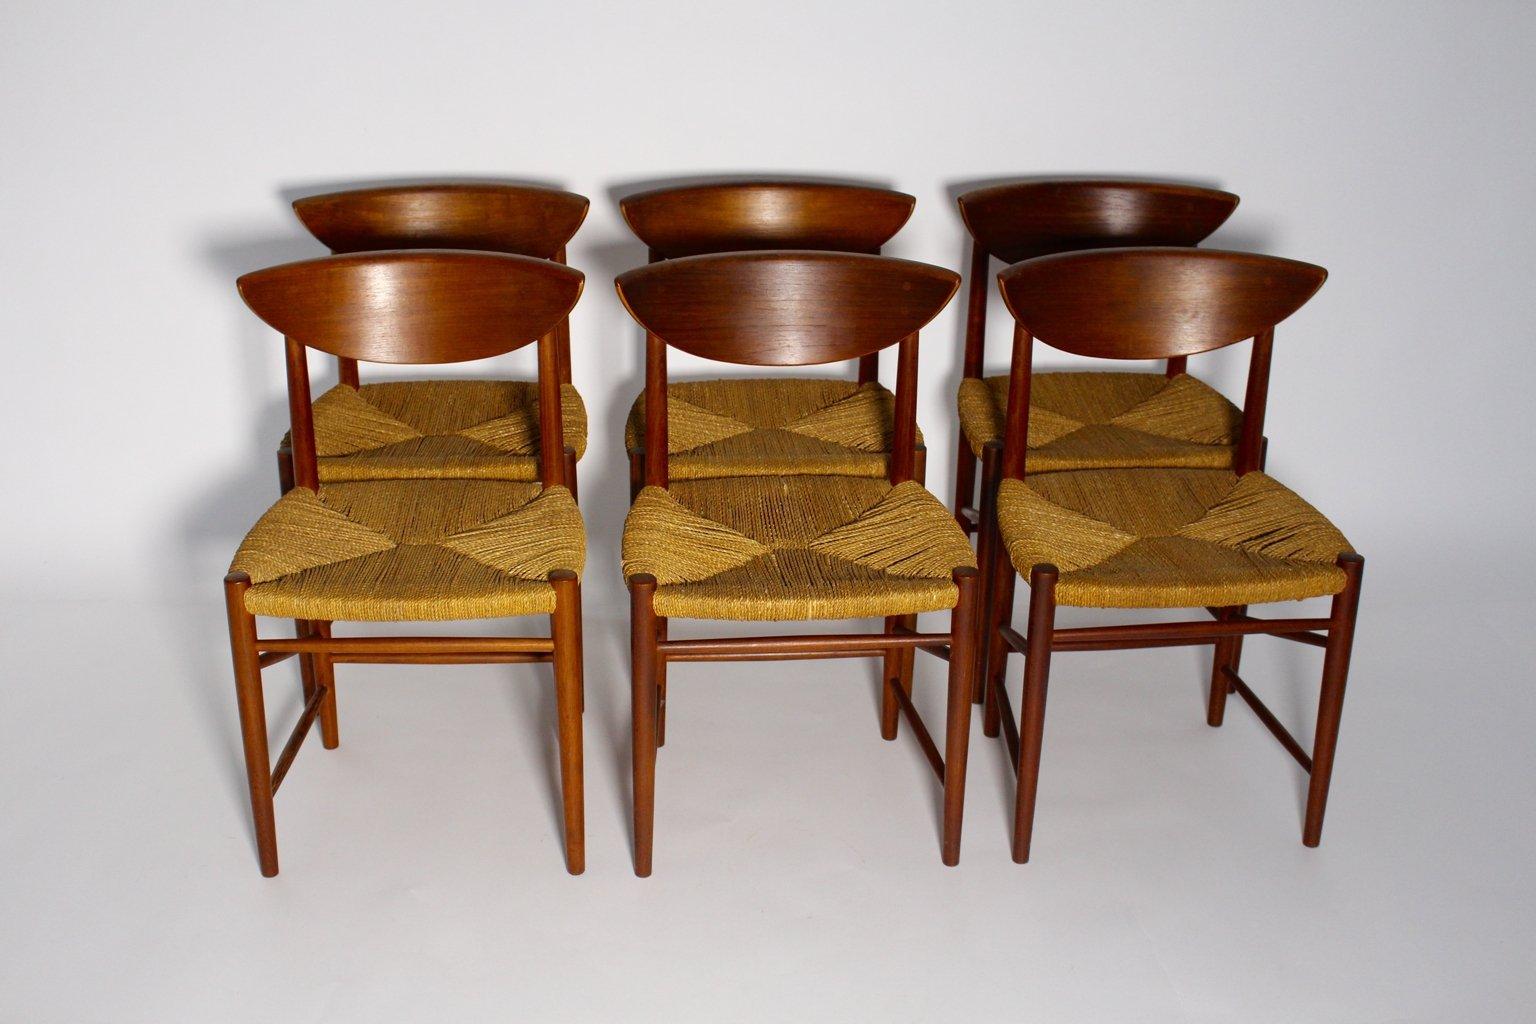 Superior Chairs By Peter Hvidt U0026 Orly Moolgard Nielsen For Søborg Møbelfabrik,  1960s, Set Of 6